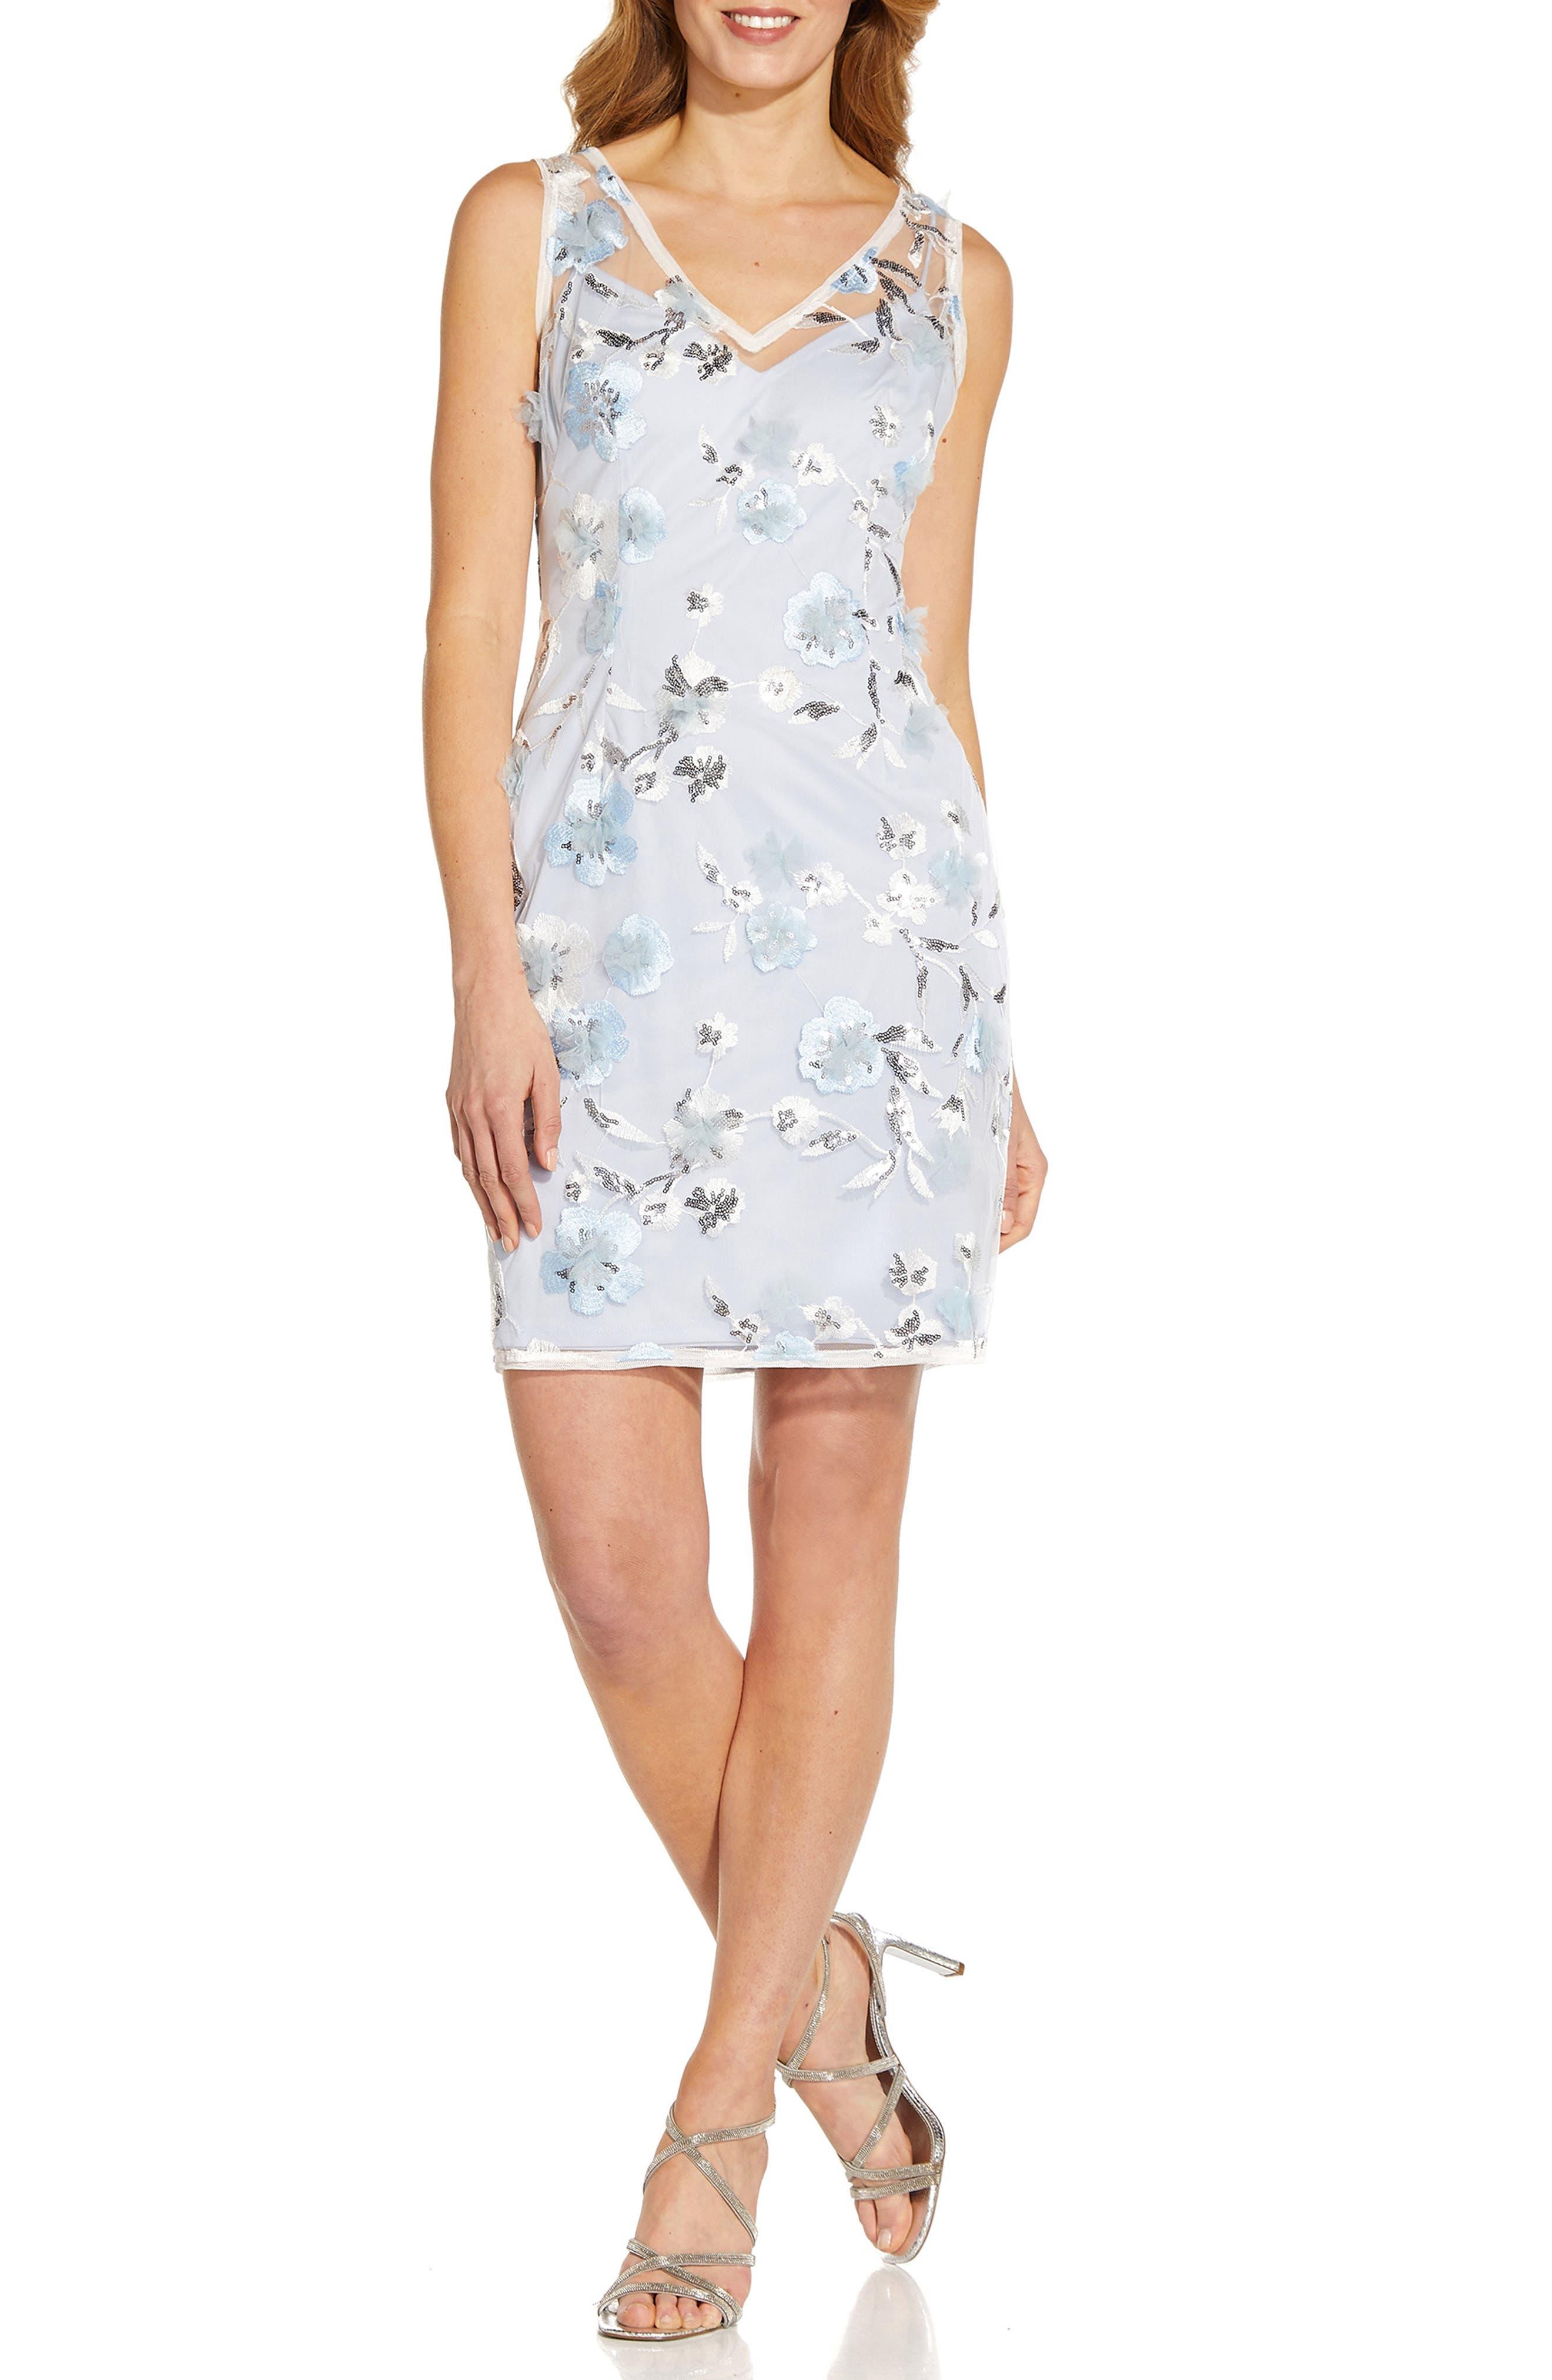 Floral Embroidery Sleeveless Sheath Dress